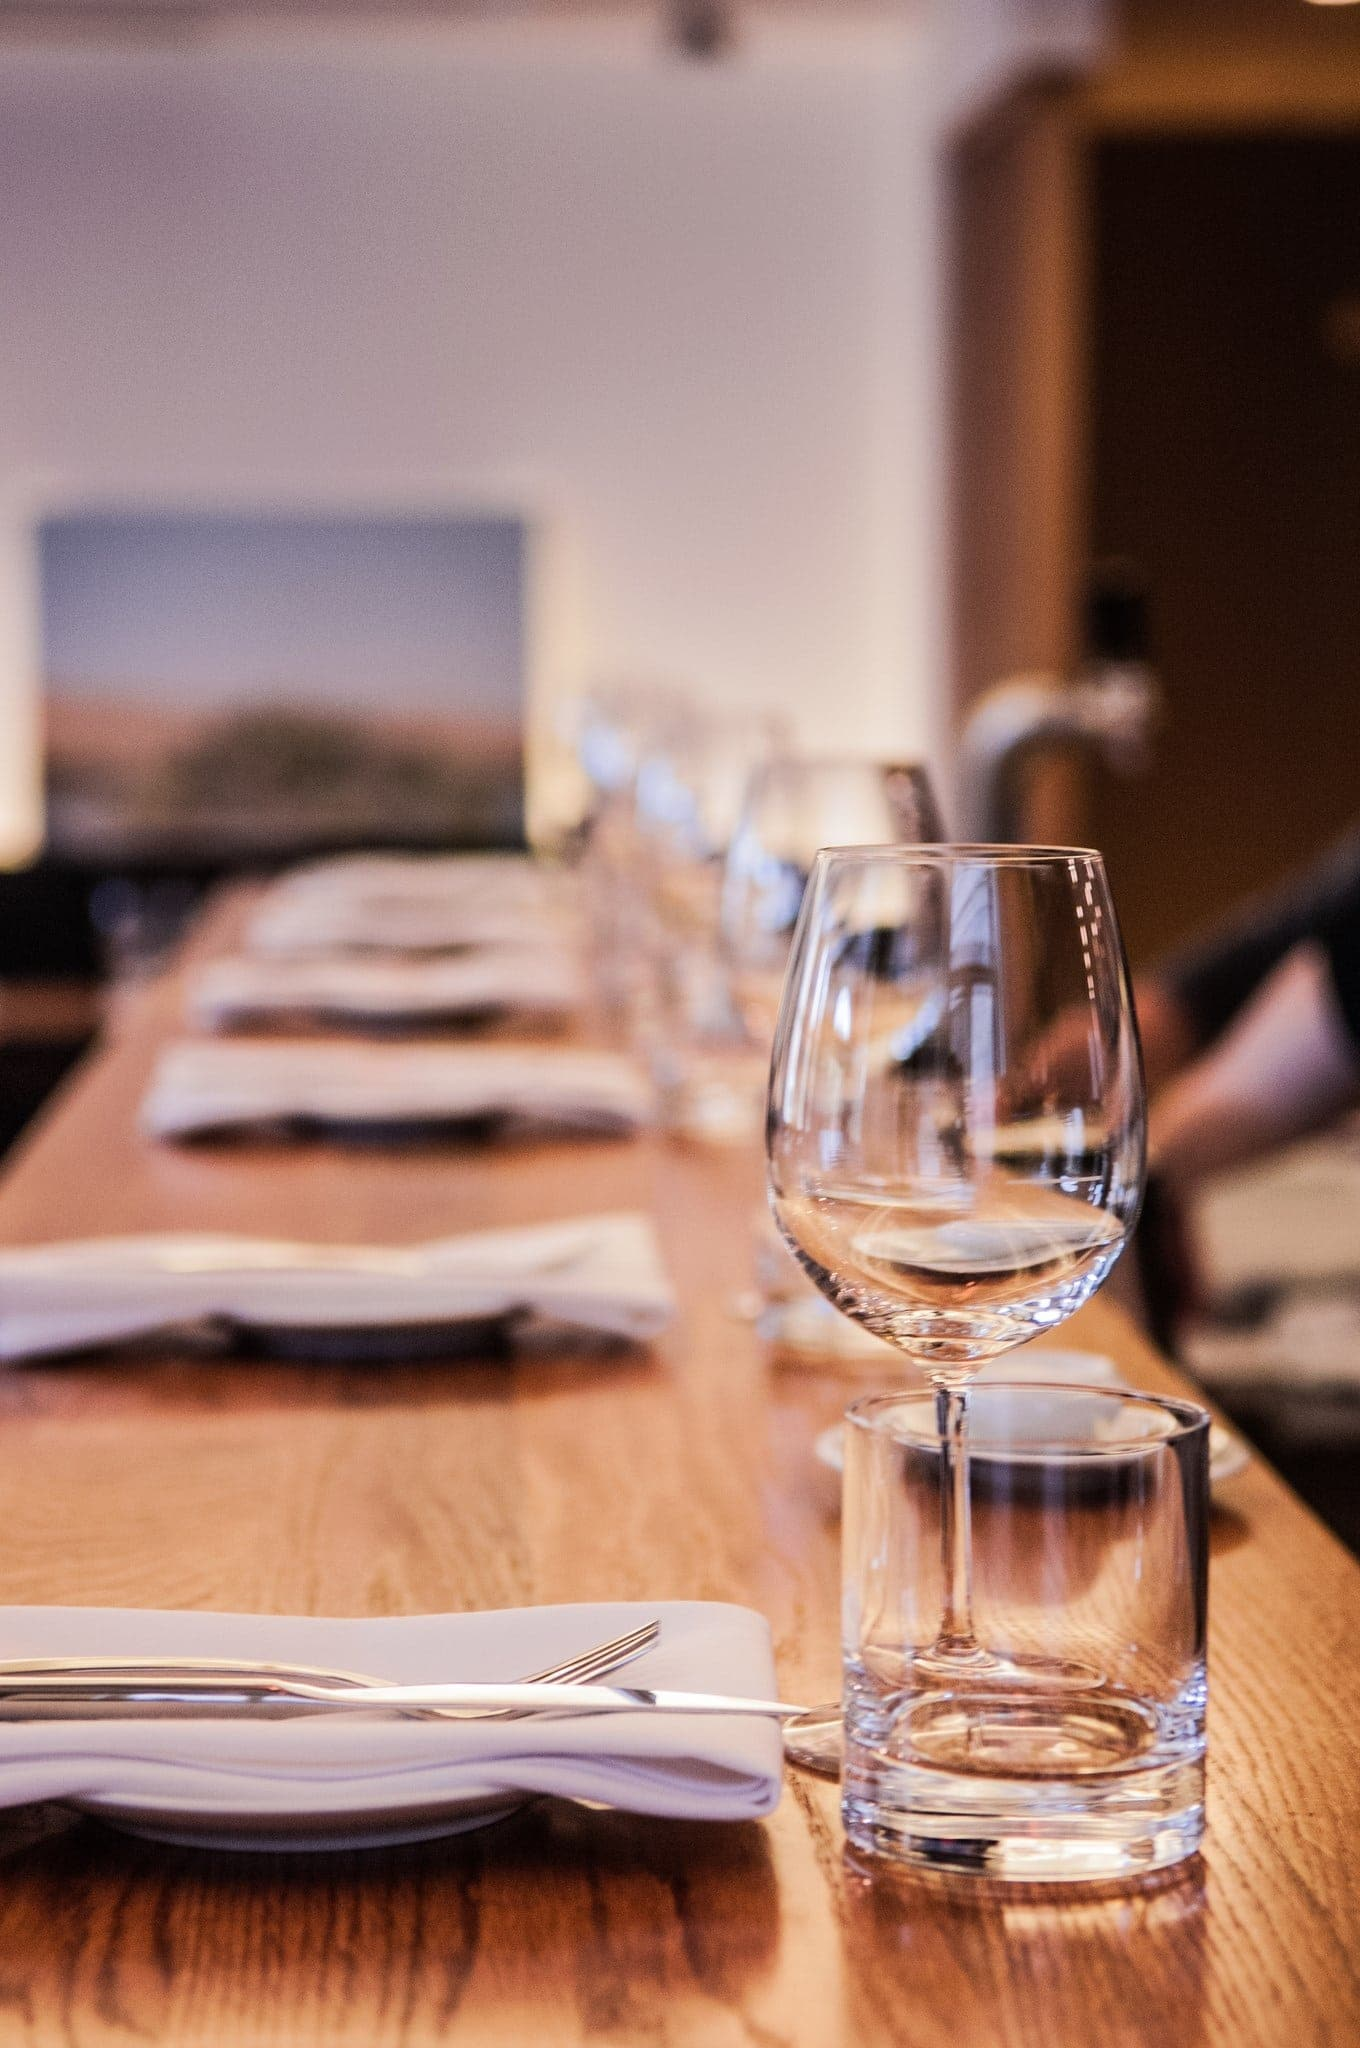 h4c-st-henri-restaurant-3